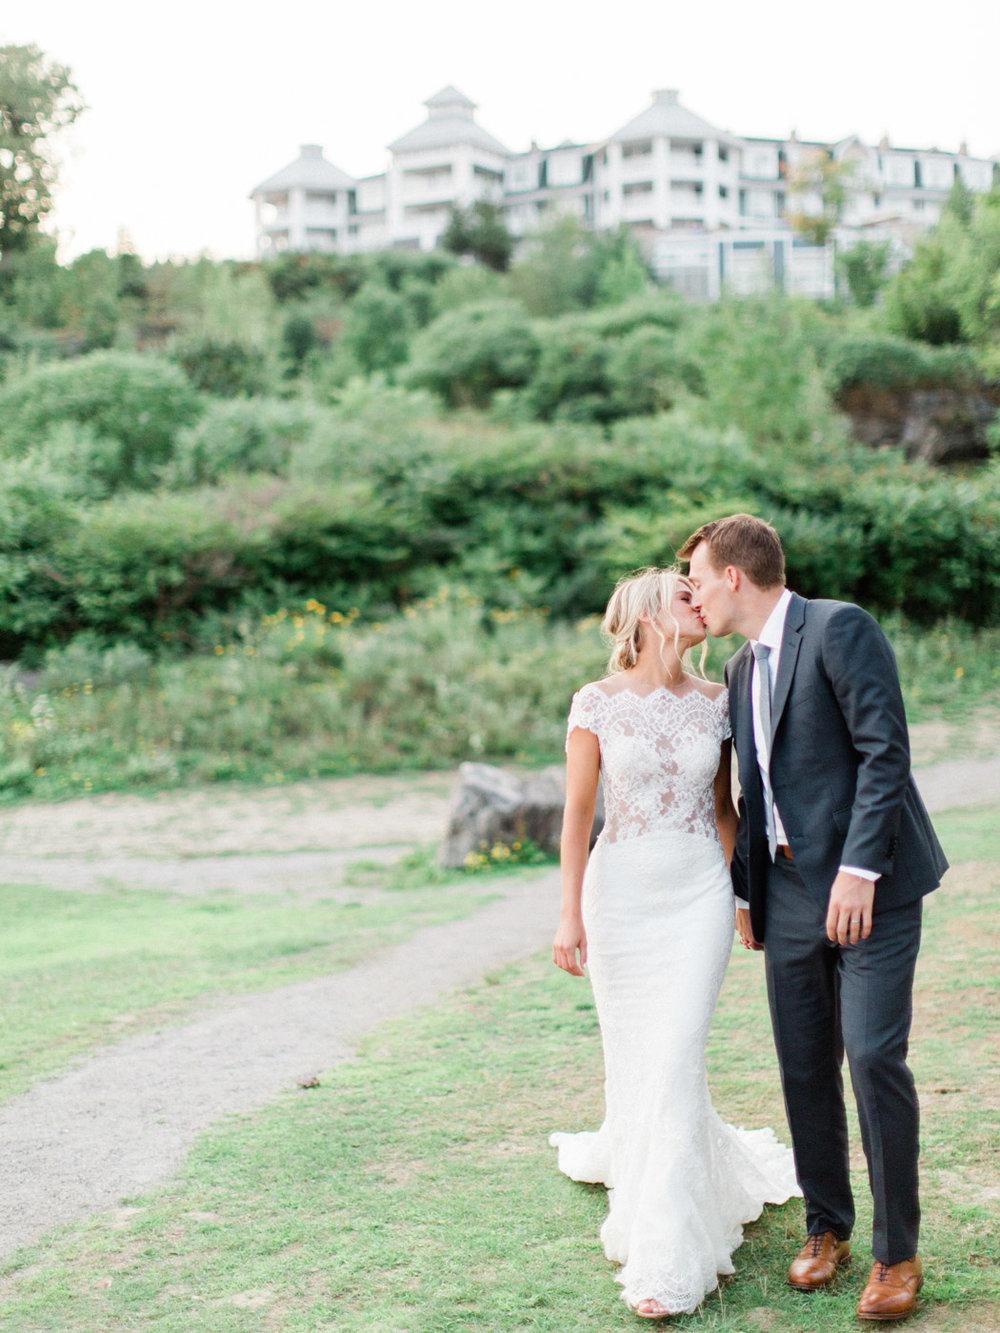 Toronto-Muskoka-wedding-photographer-summery-fun-documentary-the-marriott-rosseau121.jpg